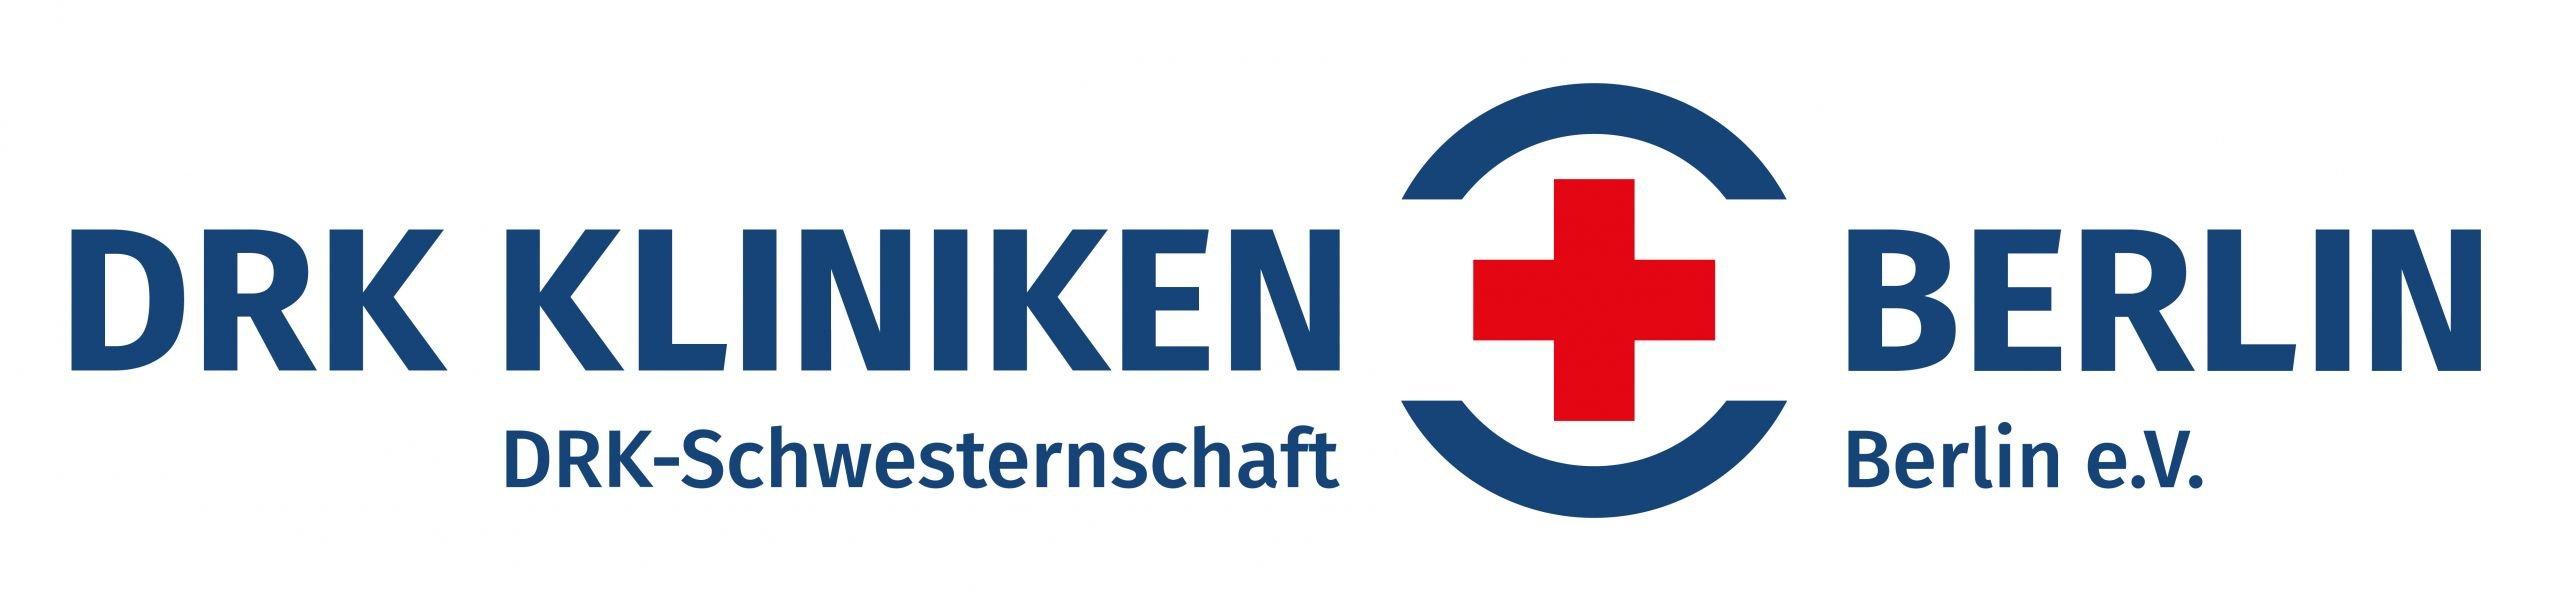 logo-drk-kliniken-kunde-kpc